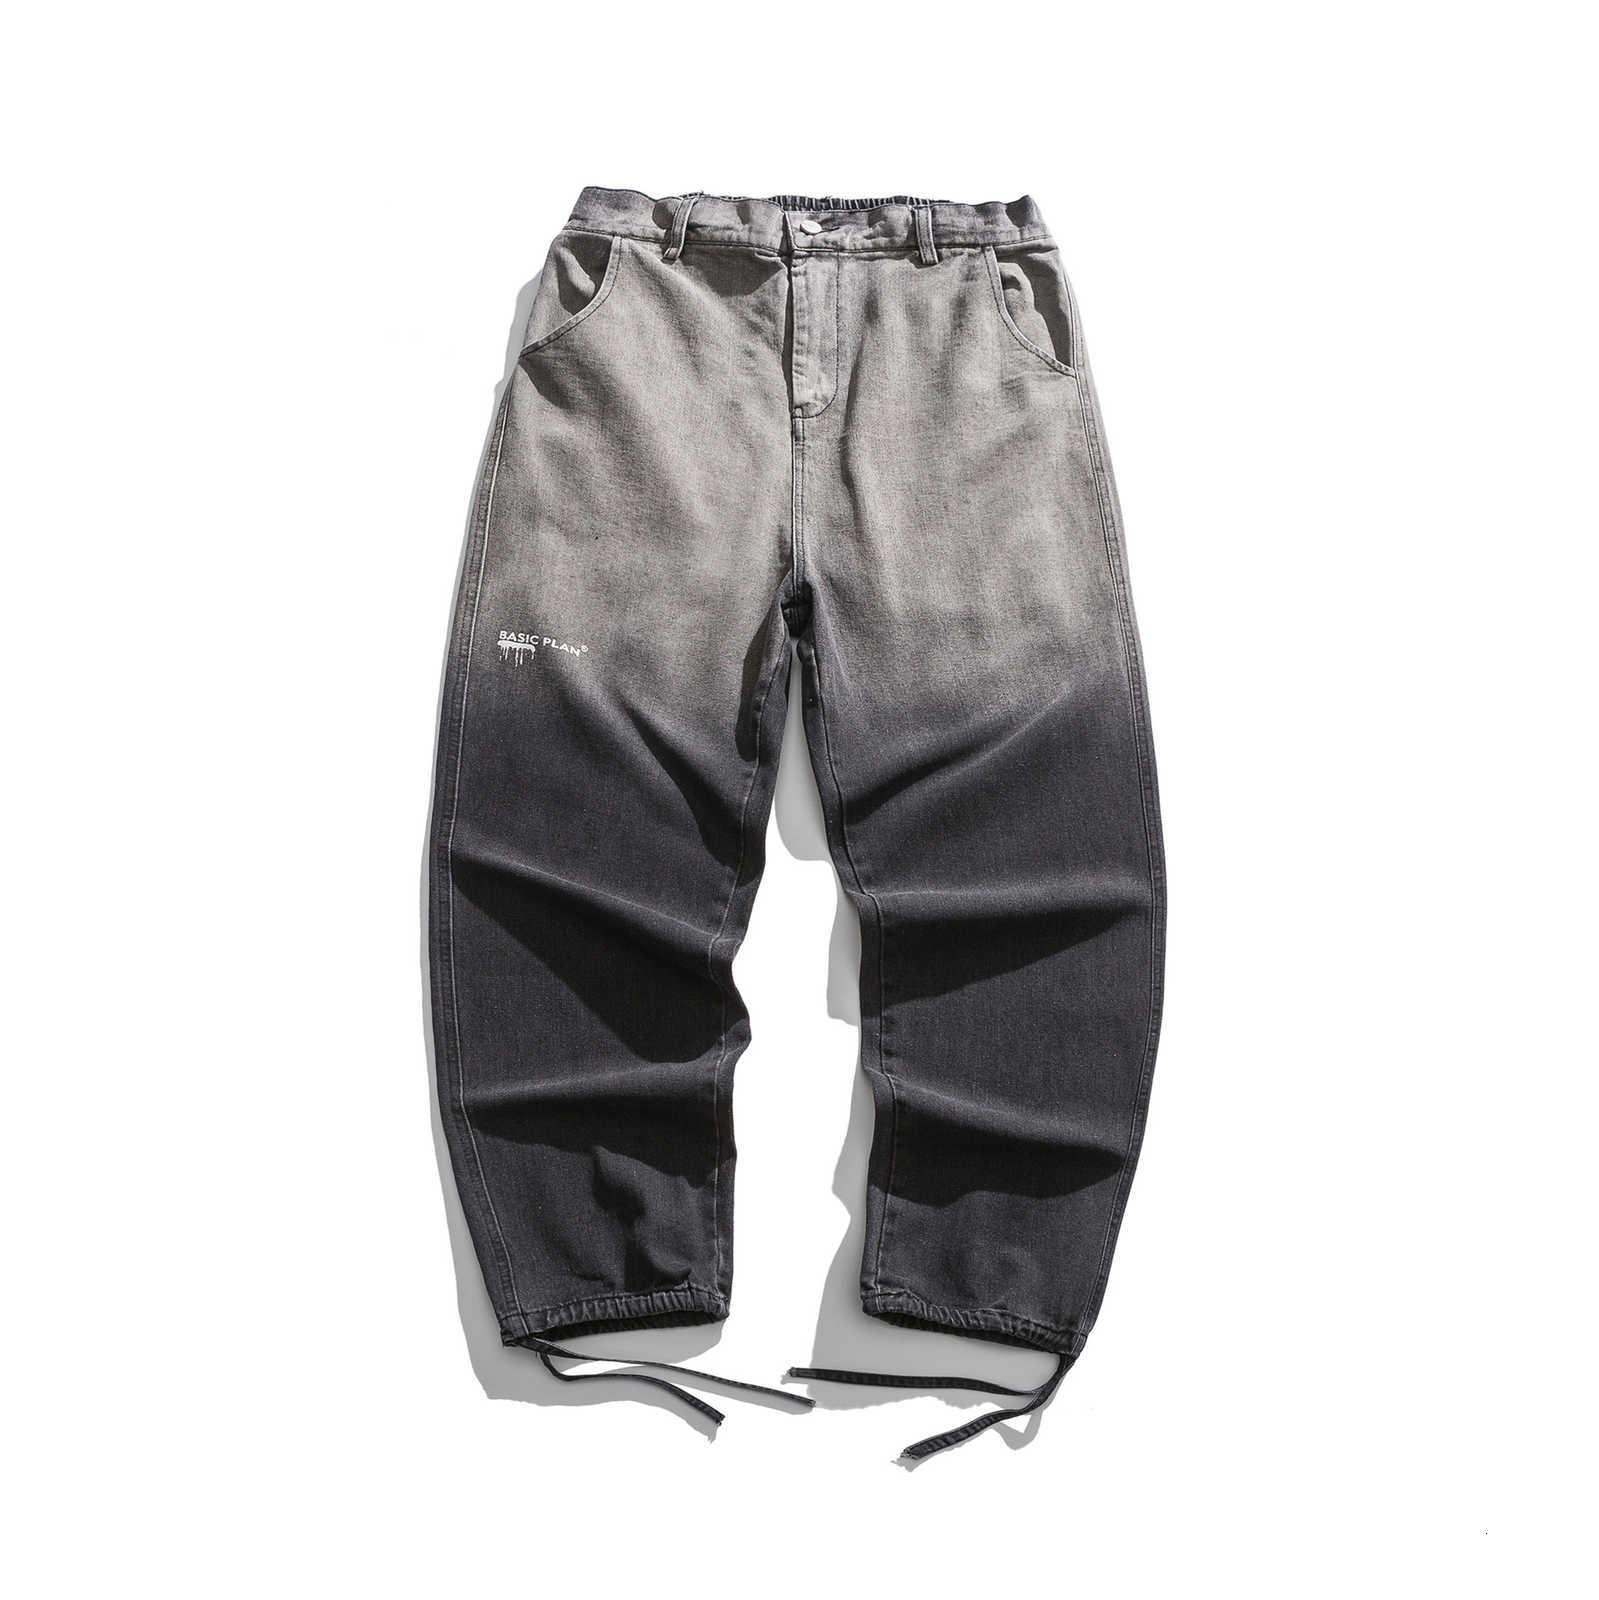 Xinchen 2021 Spring Jeans Herrenmarke Gerade Röhre Lose Harlan Casual Hose Mode